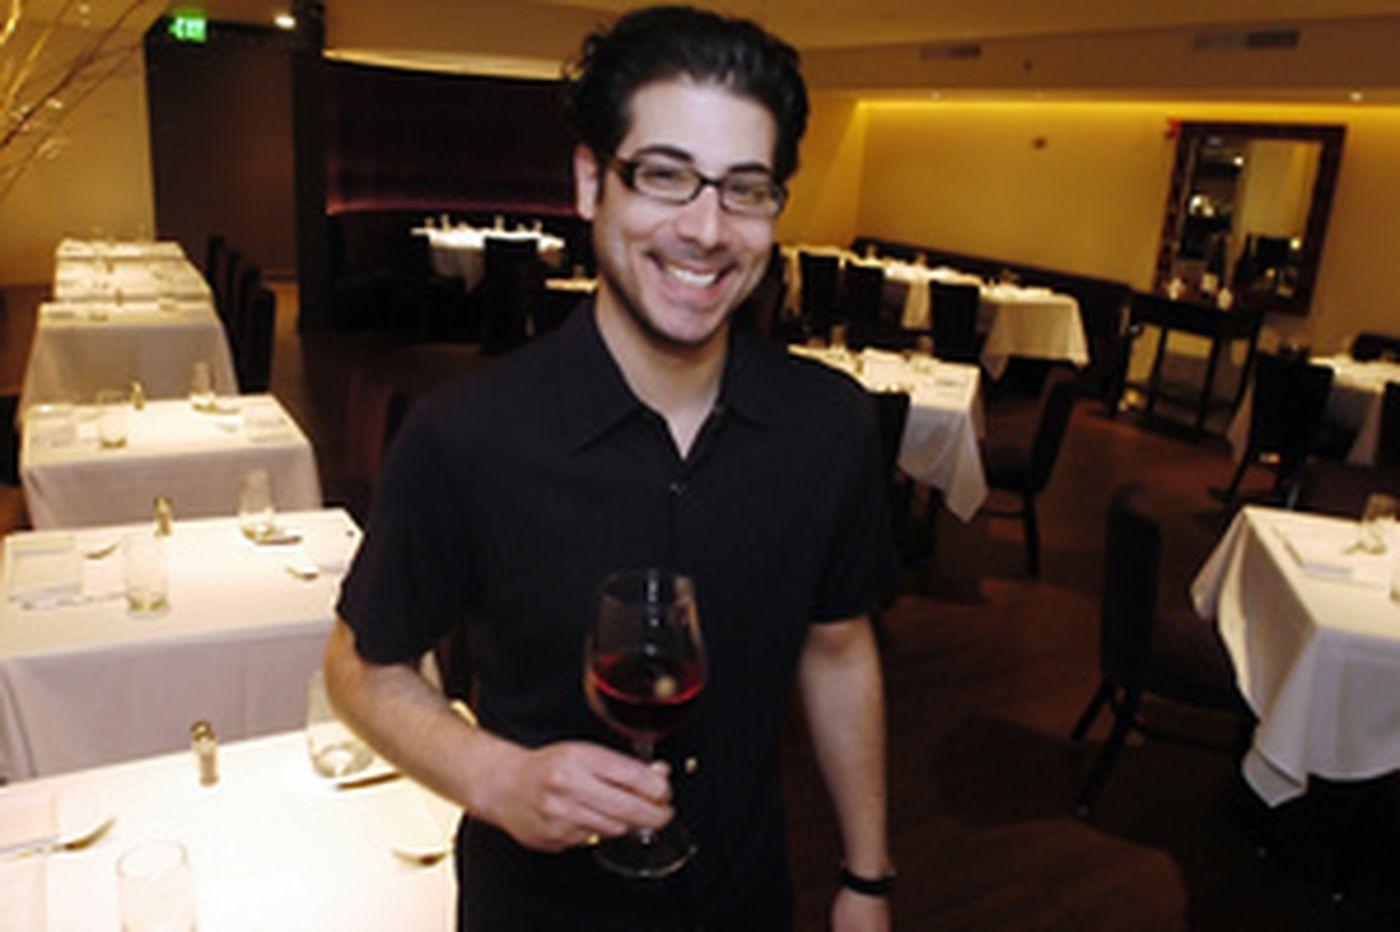 Table Talk | 707 restaurant-lounge opens near Washington Square